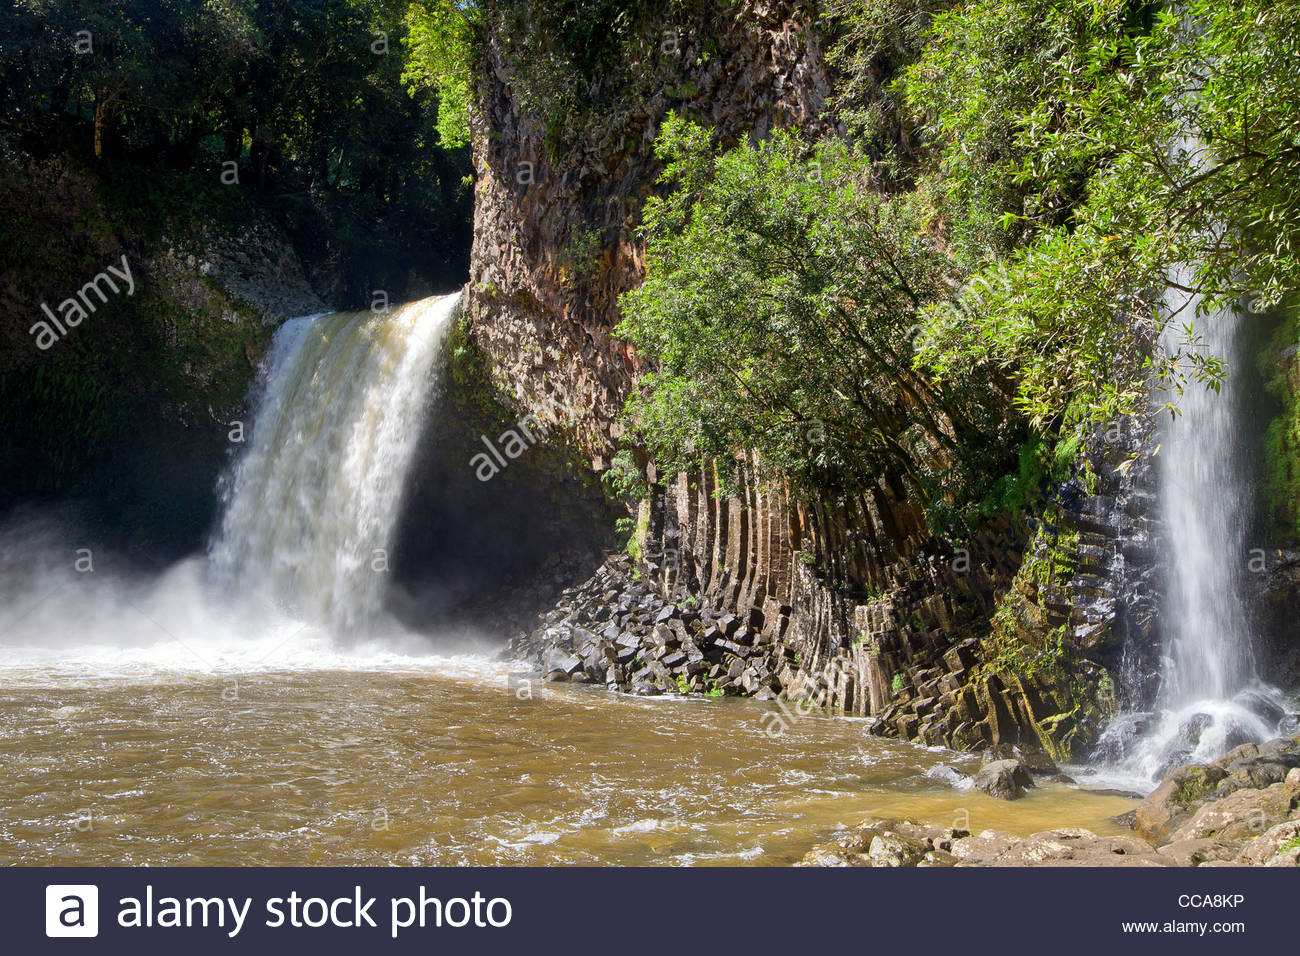 Bassin la paix waterfalls on Reunion island - Stock Image